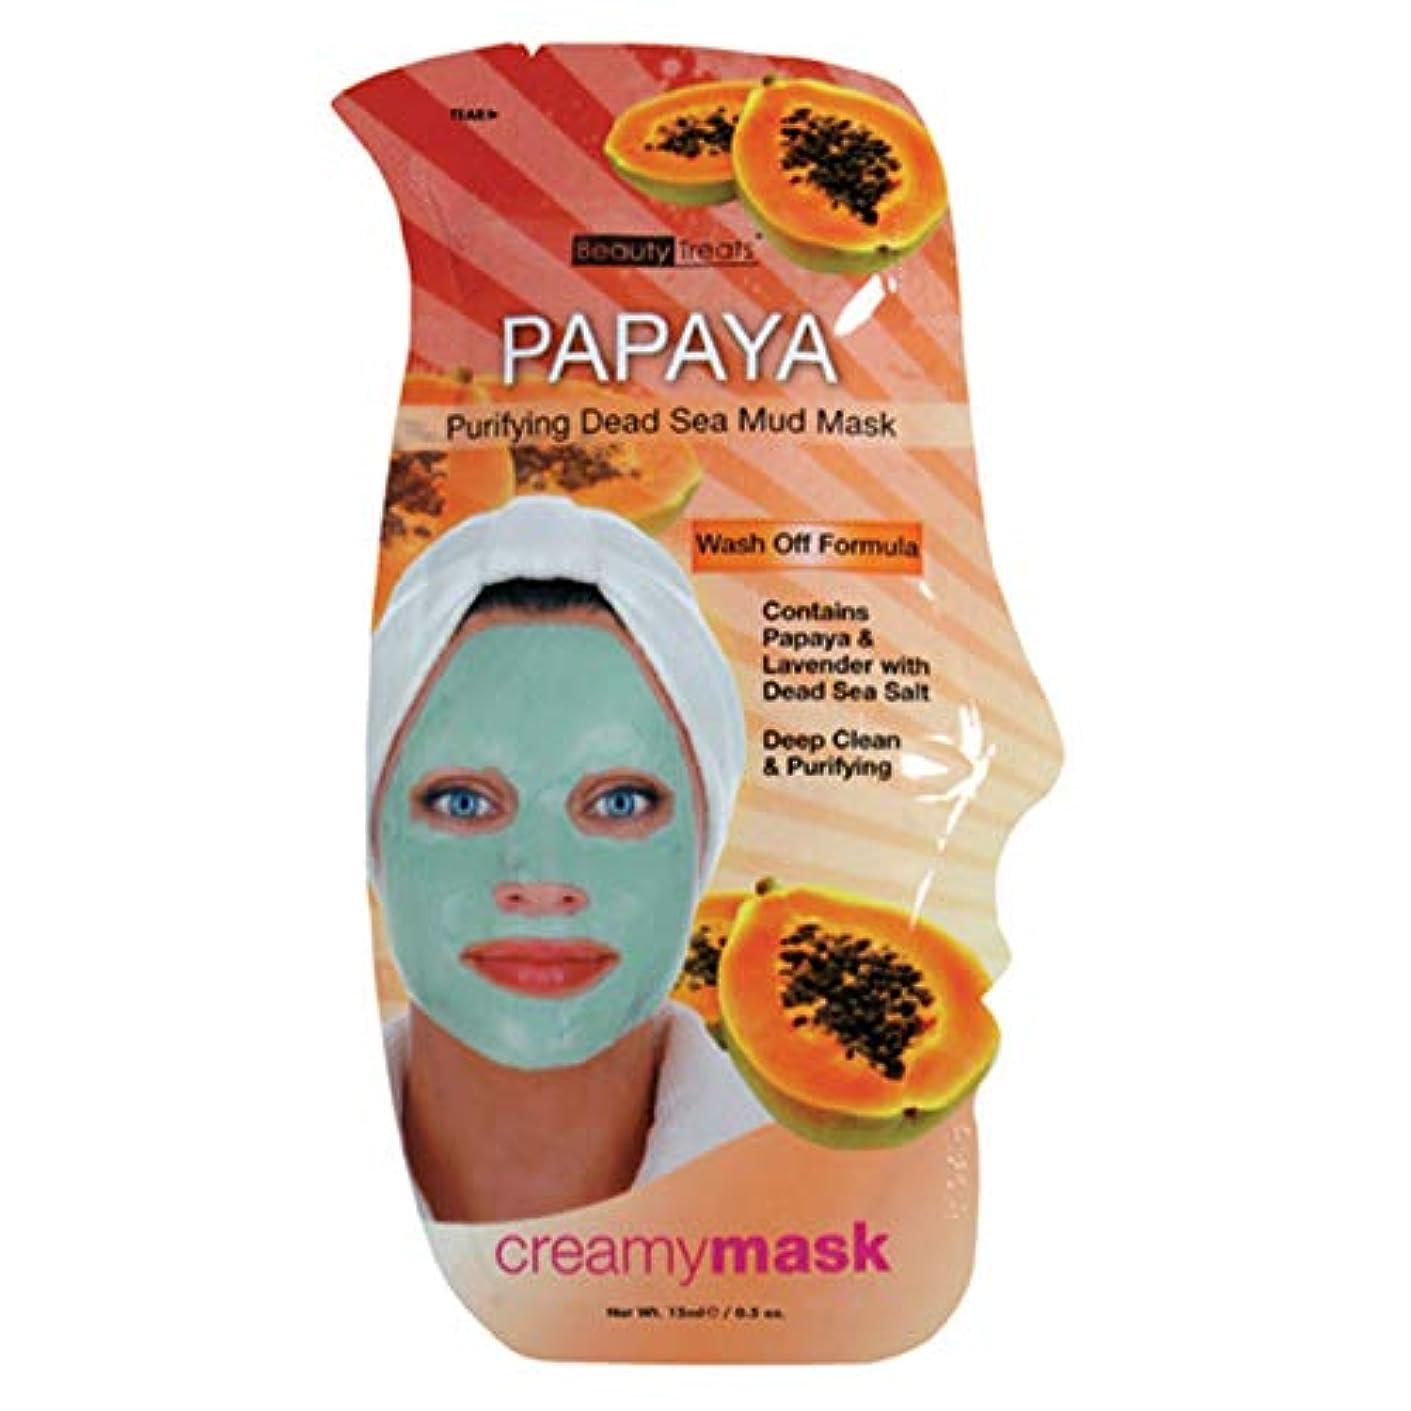 乳白色劇作家中絶BEAUTY TREATS Papaya Purifying Dead Sea Mud Mask - Papaya (並行輸入品)